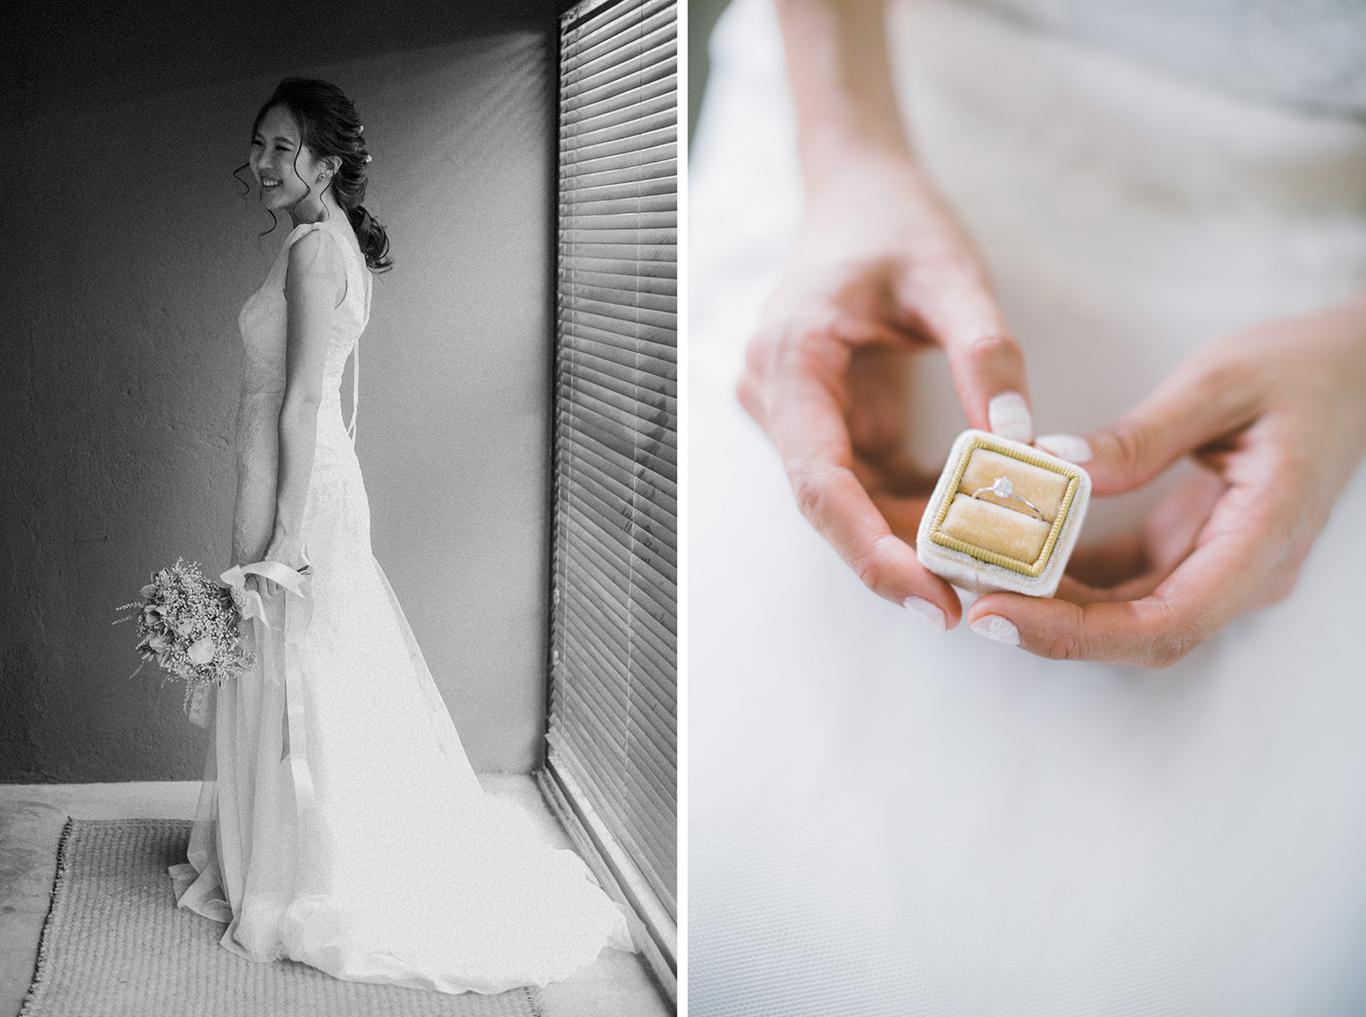 23-hellojanelee-emily-bangsar-rom-wedding